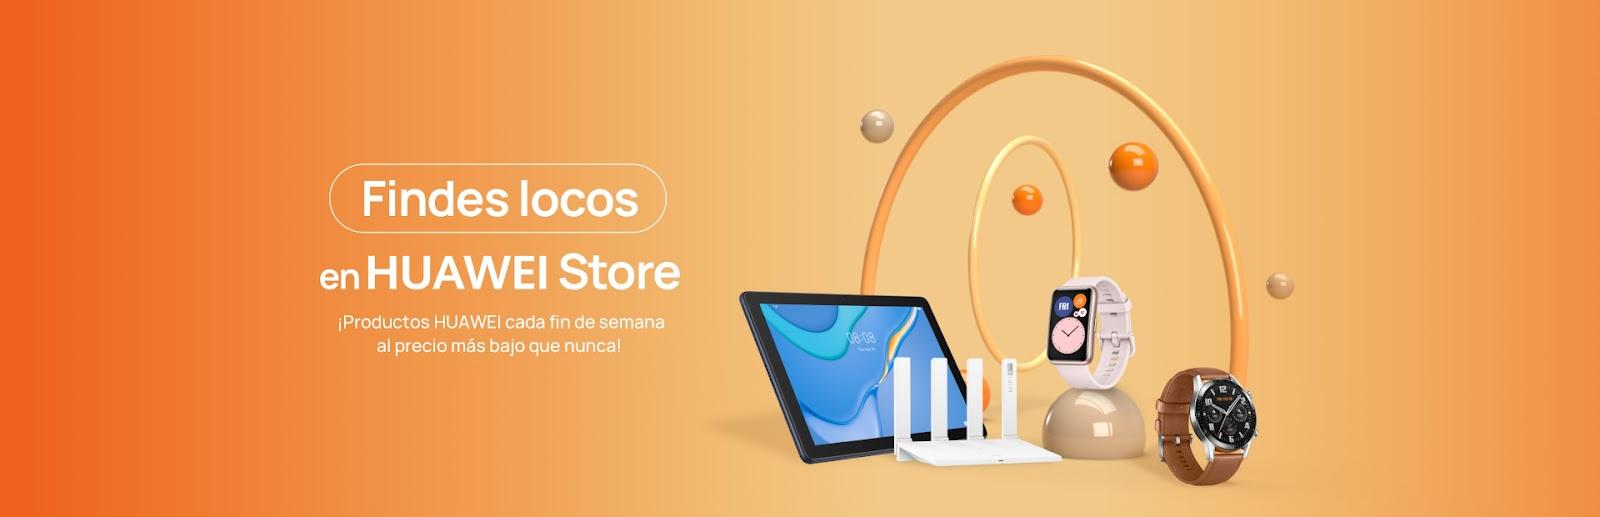 top-5-ofertas-findes-locos-17-19-septiembre-huawei-store